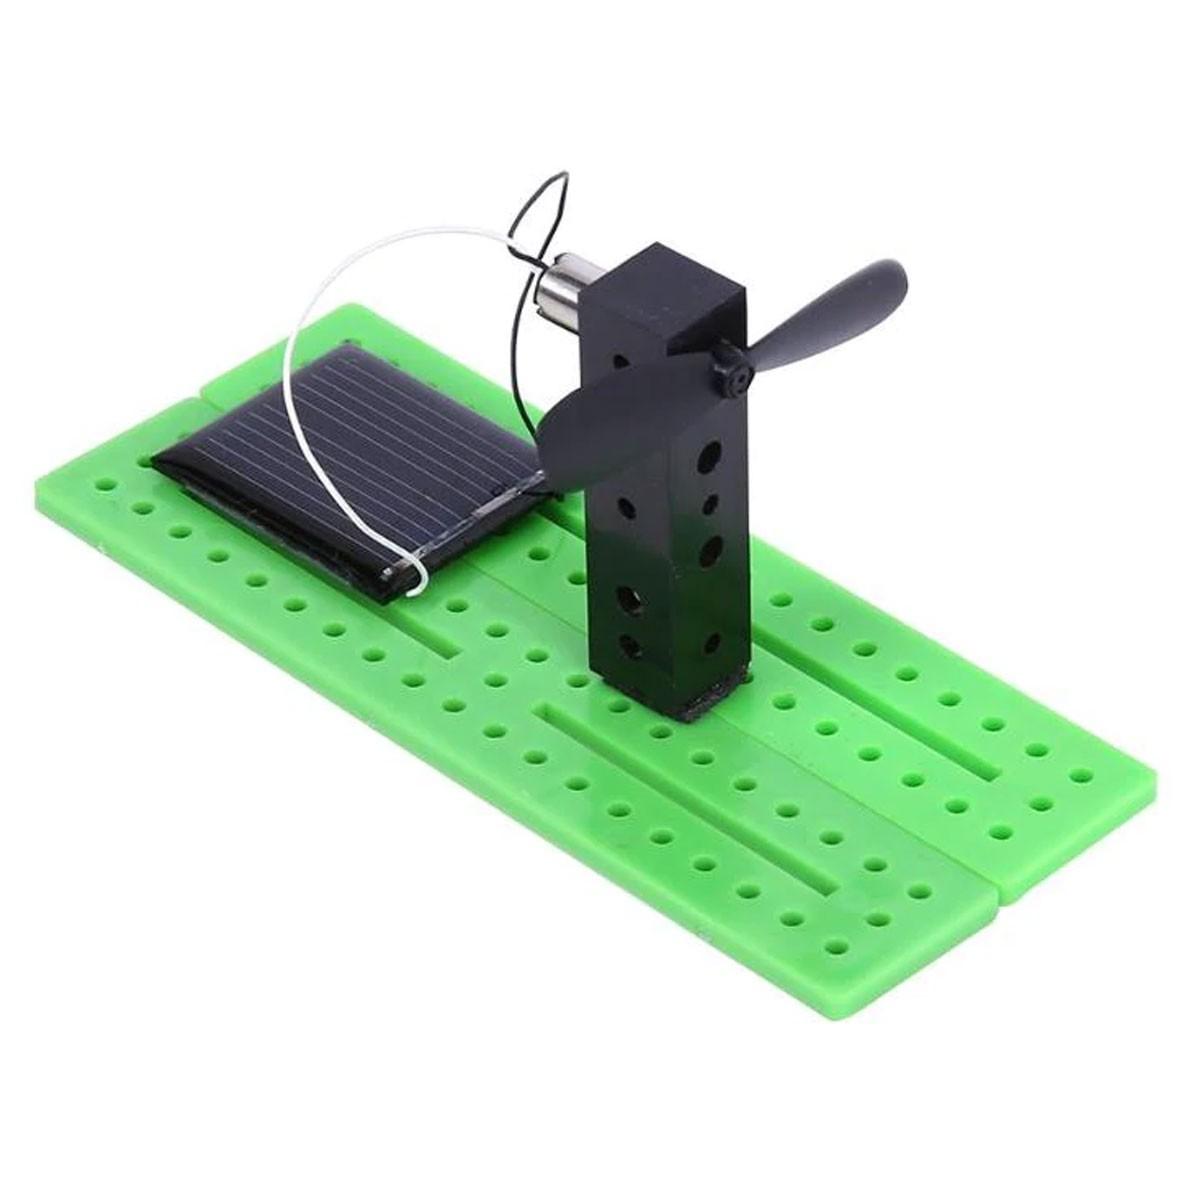 Kit Montagem Brinquedo Solar: Torre / Mini Ventilador movido a energia solar